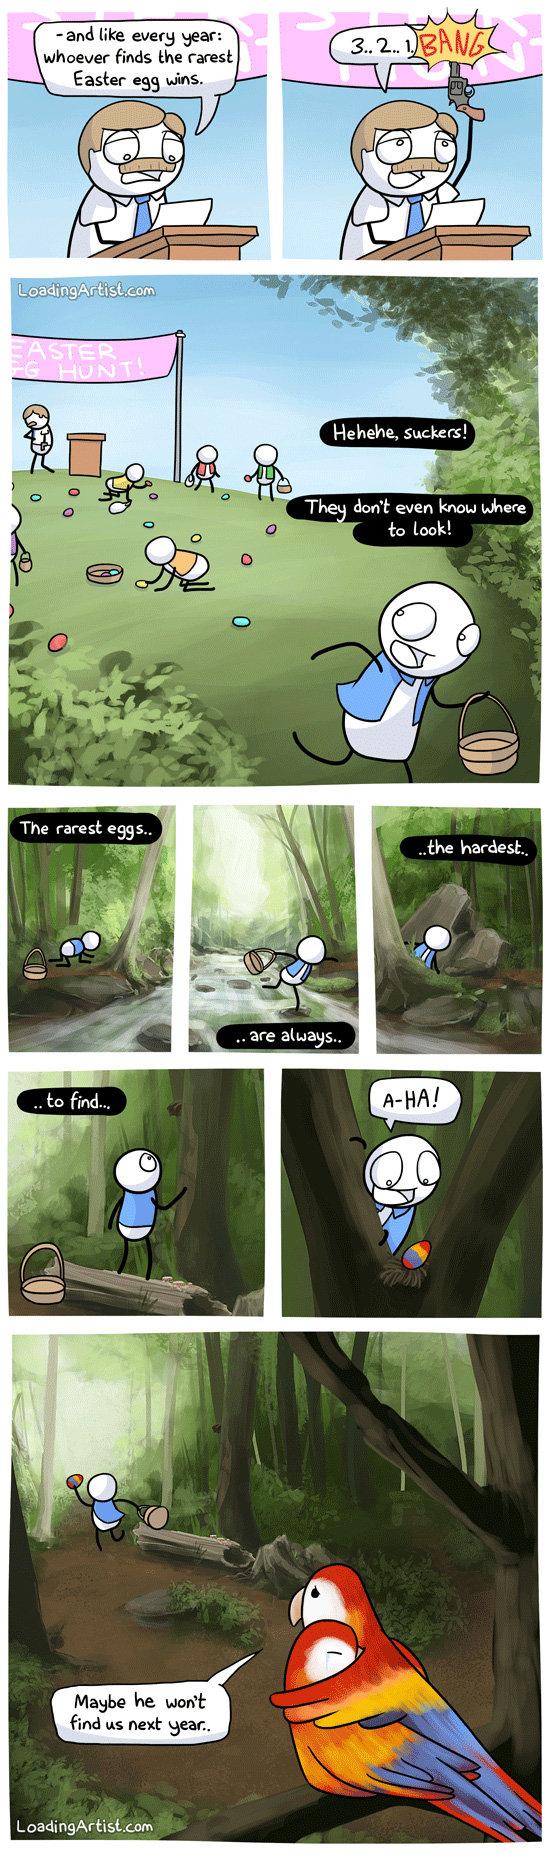 The rarest egg. . and like every gear: l Finds the rarest Mayne he 'ABBI MTE us next 3231:.. now i'm sad.